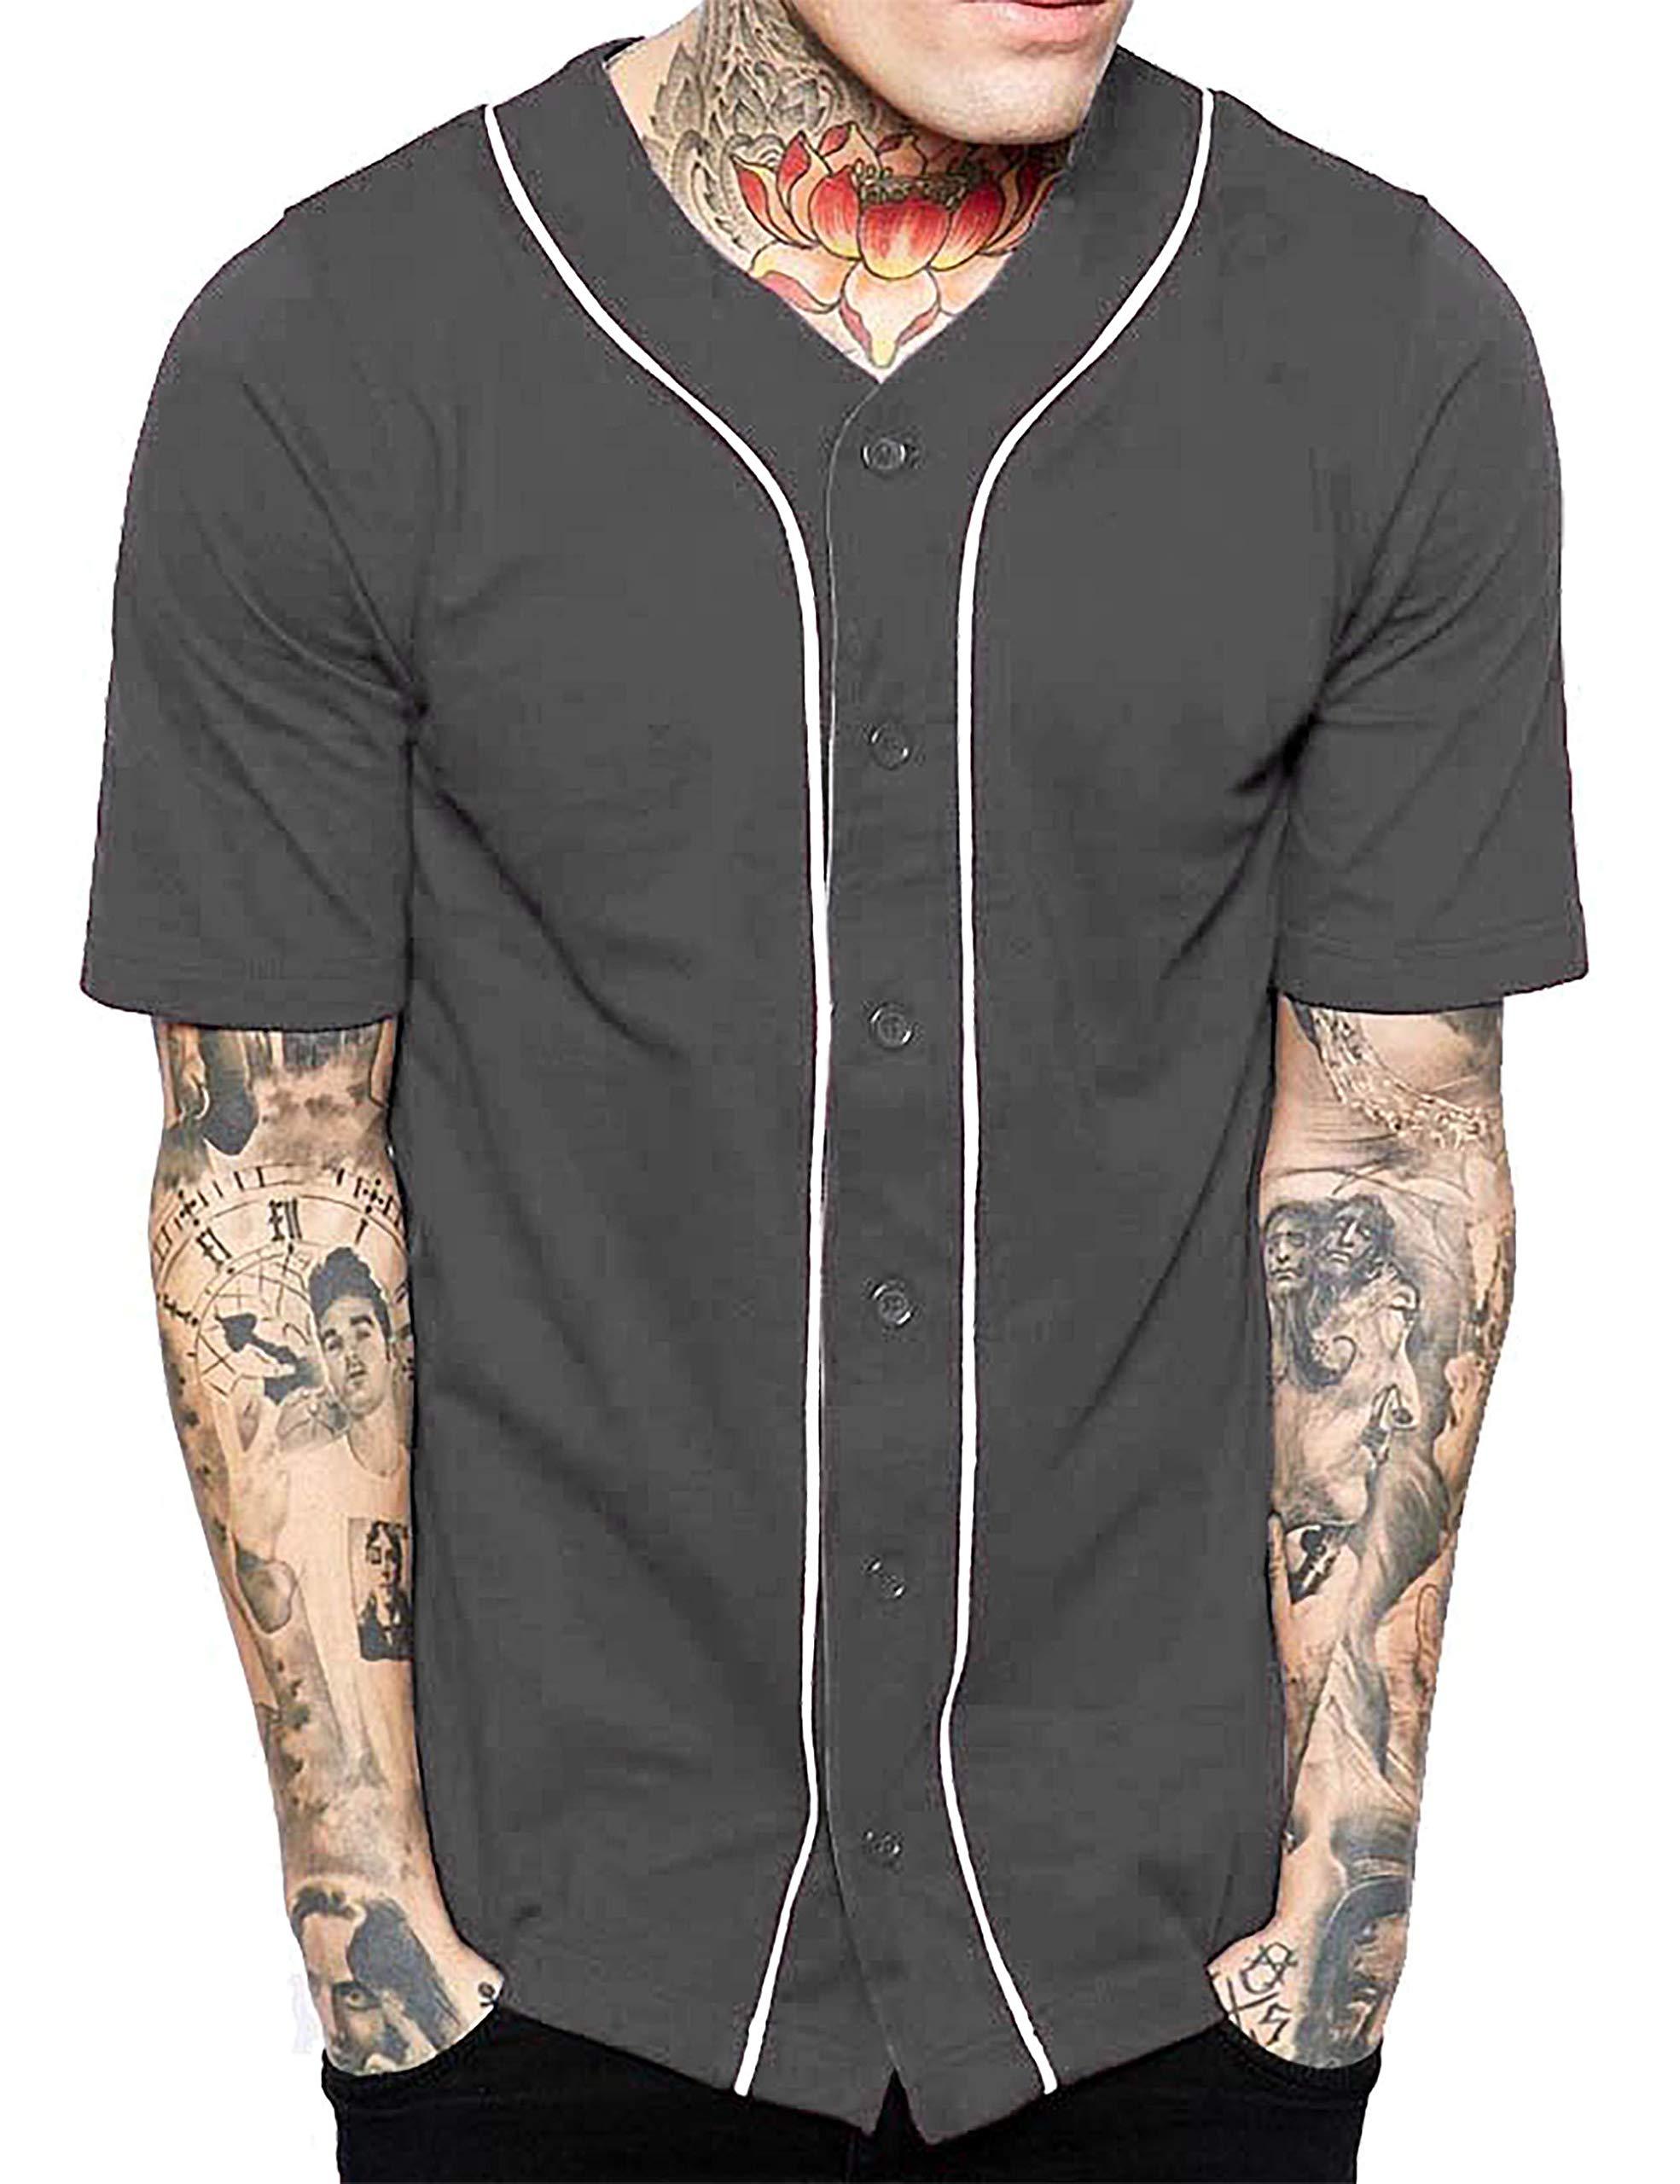 Hat and Beyond Mens Baseball Button Down Jersey Hipster Hip Hop T Shirts 1UPA01 (Dark Gray/White, Medium)